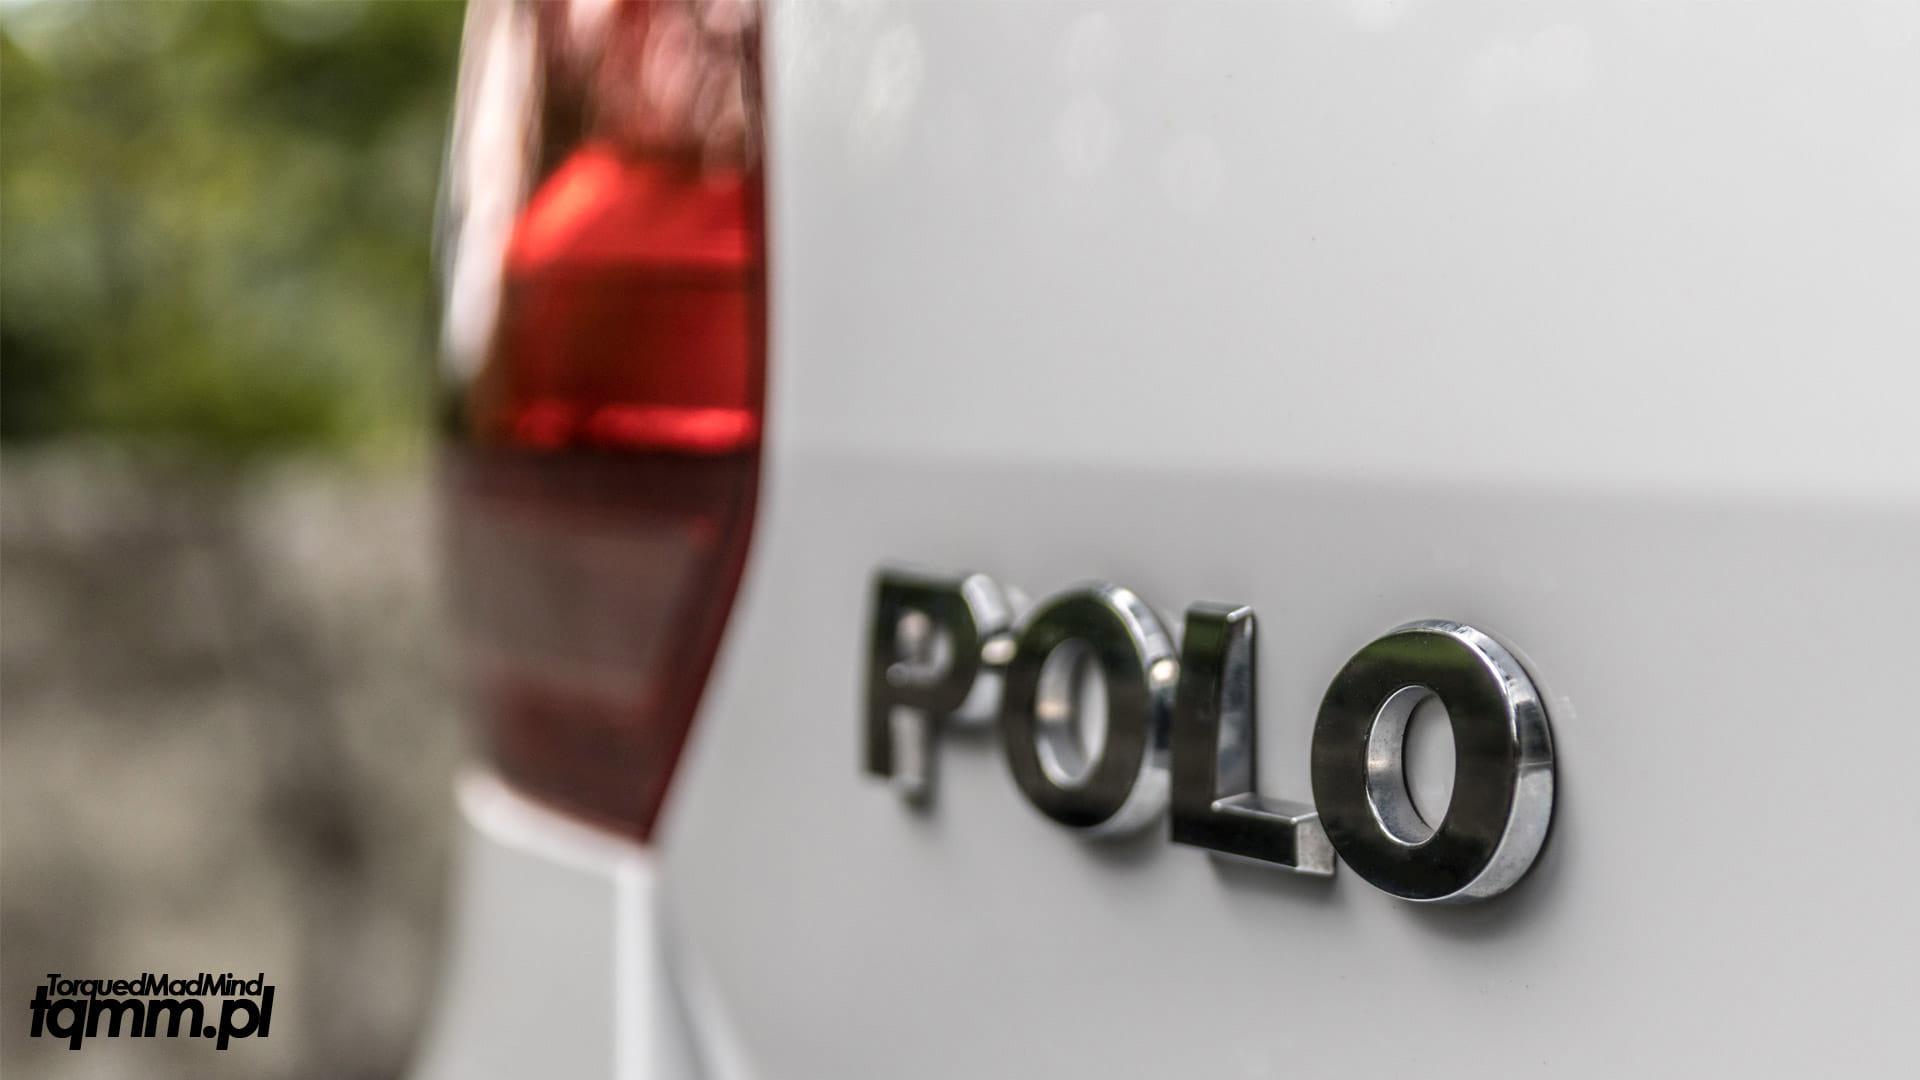 Fotki #117: Volkswagen Polo 6C